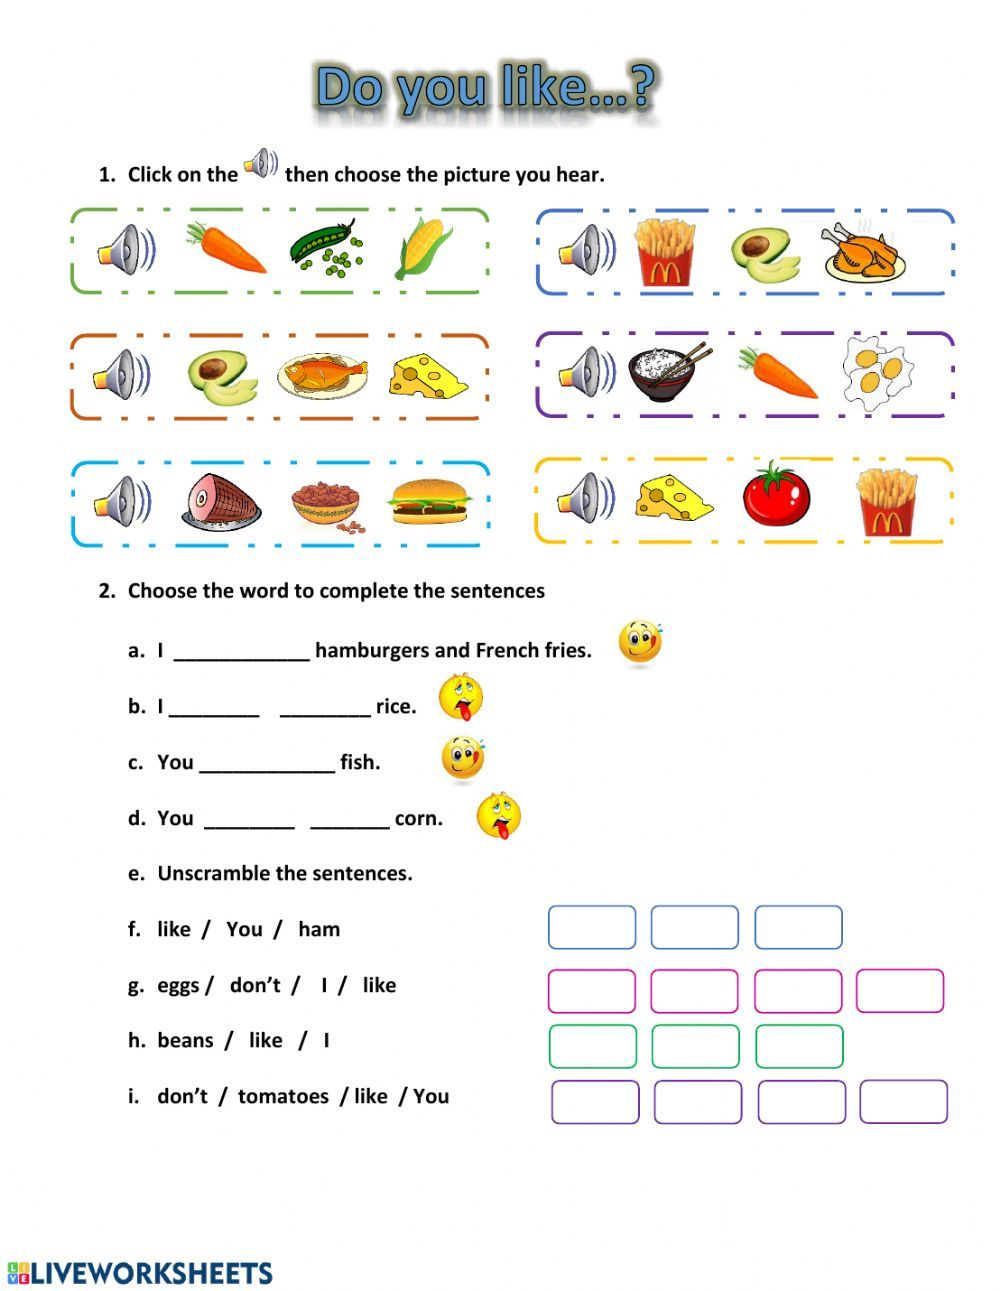 Likes and Dislikes (food) Interactive worksheet